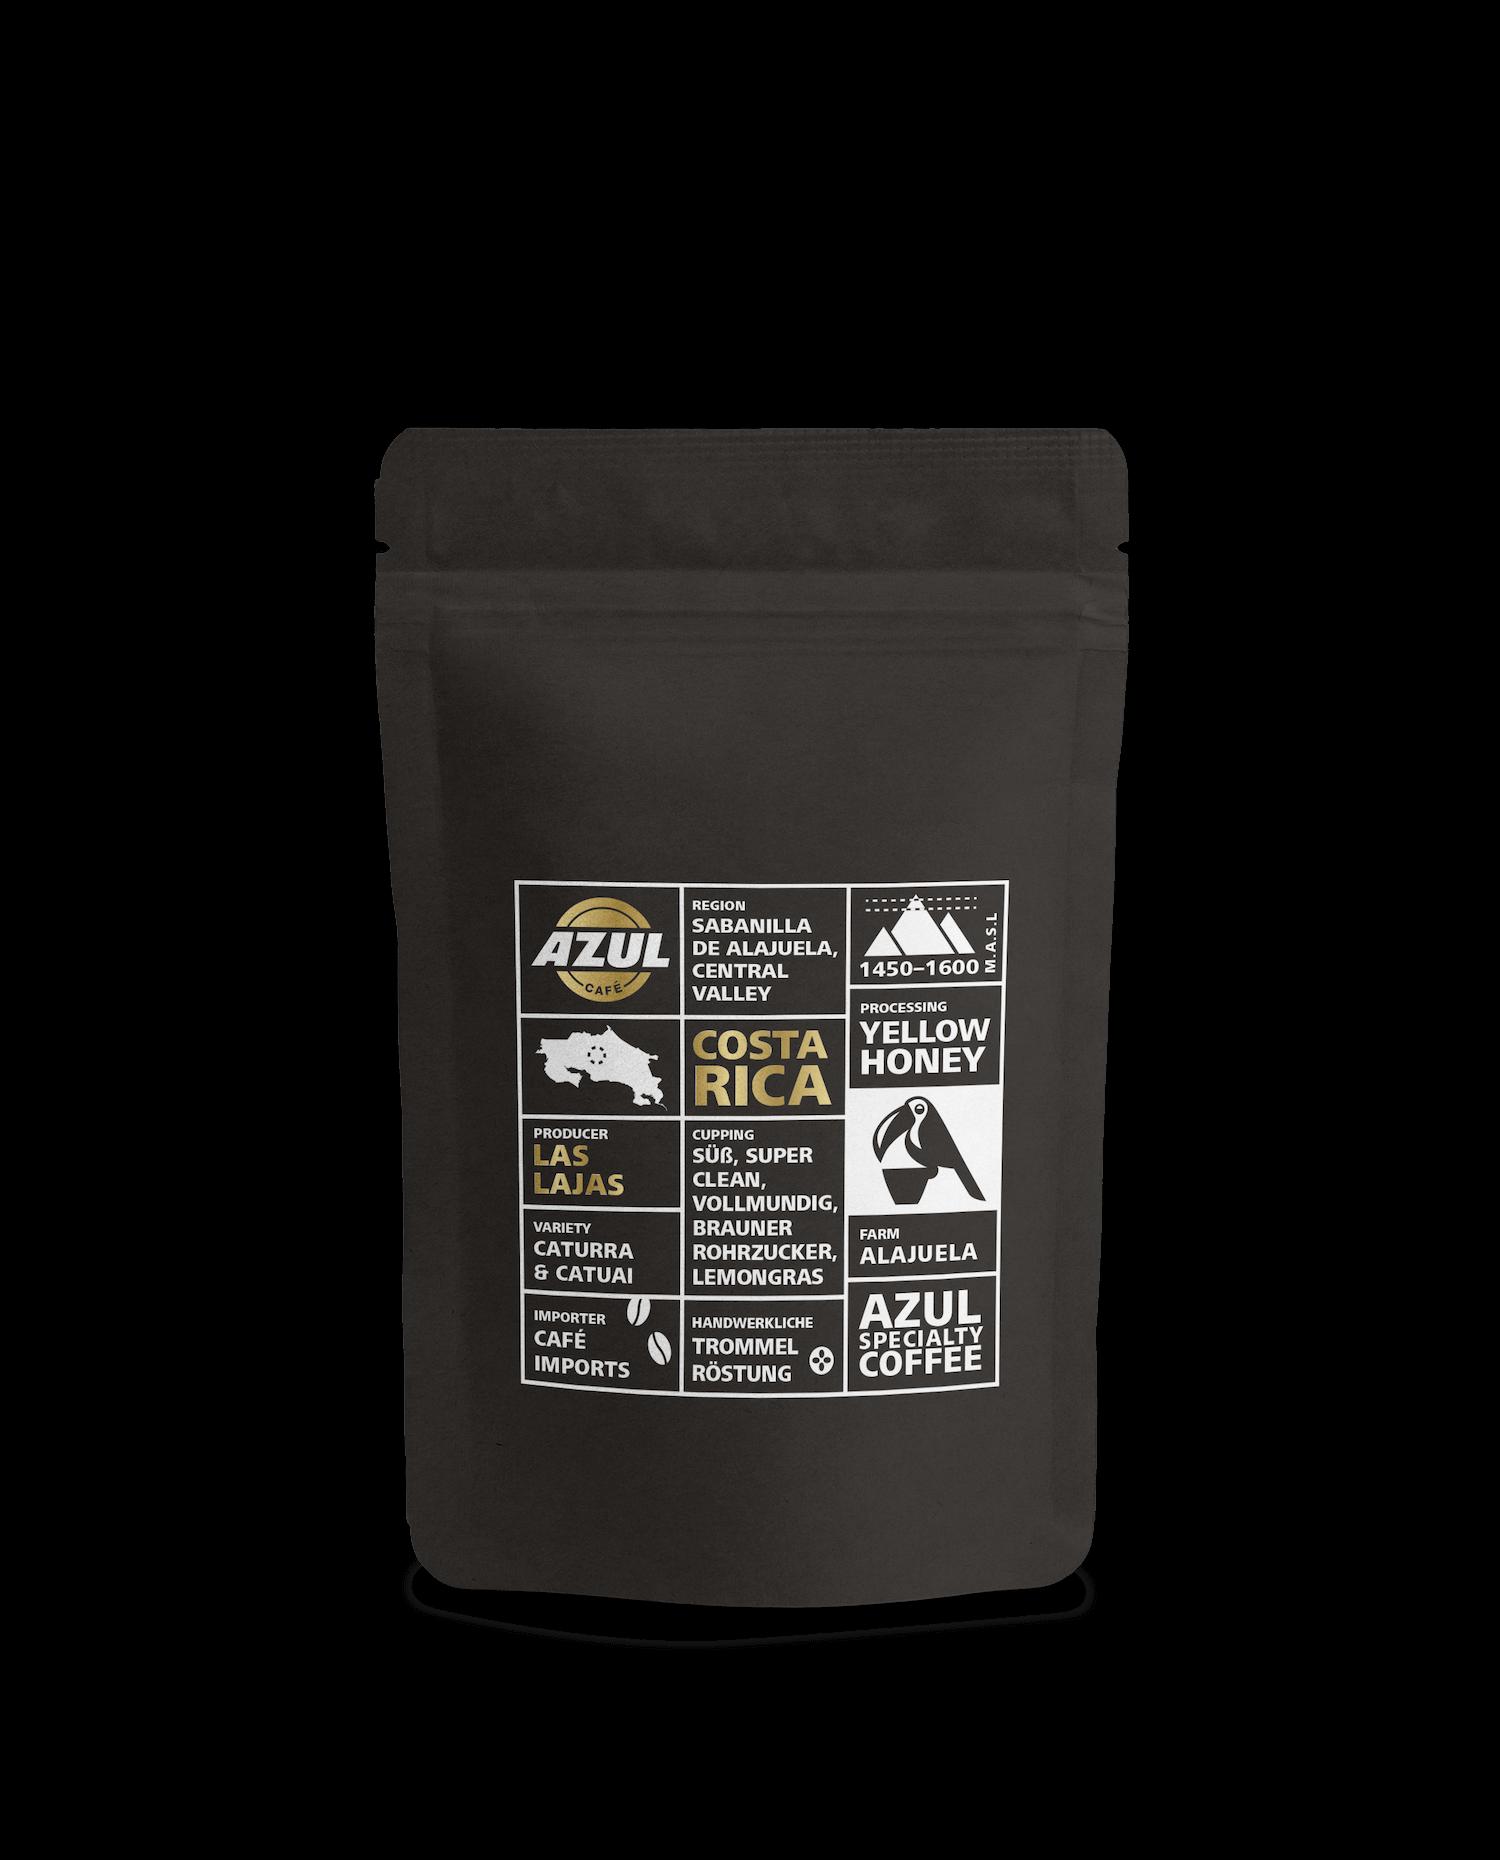 Azul Kaffee – Specialty Coffee Costa Rica Las Lajas